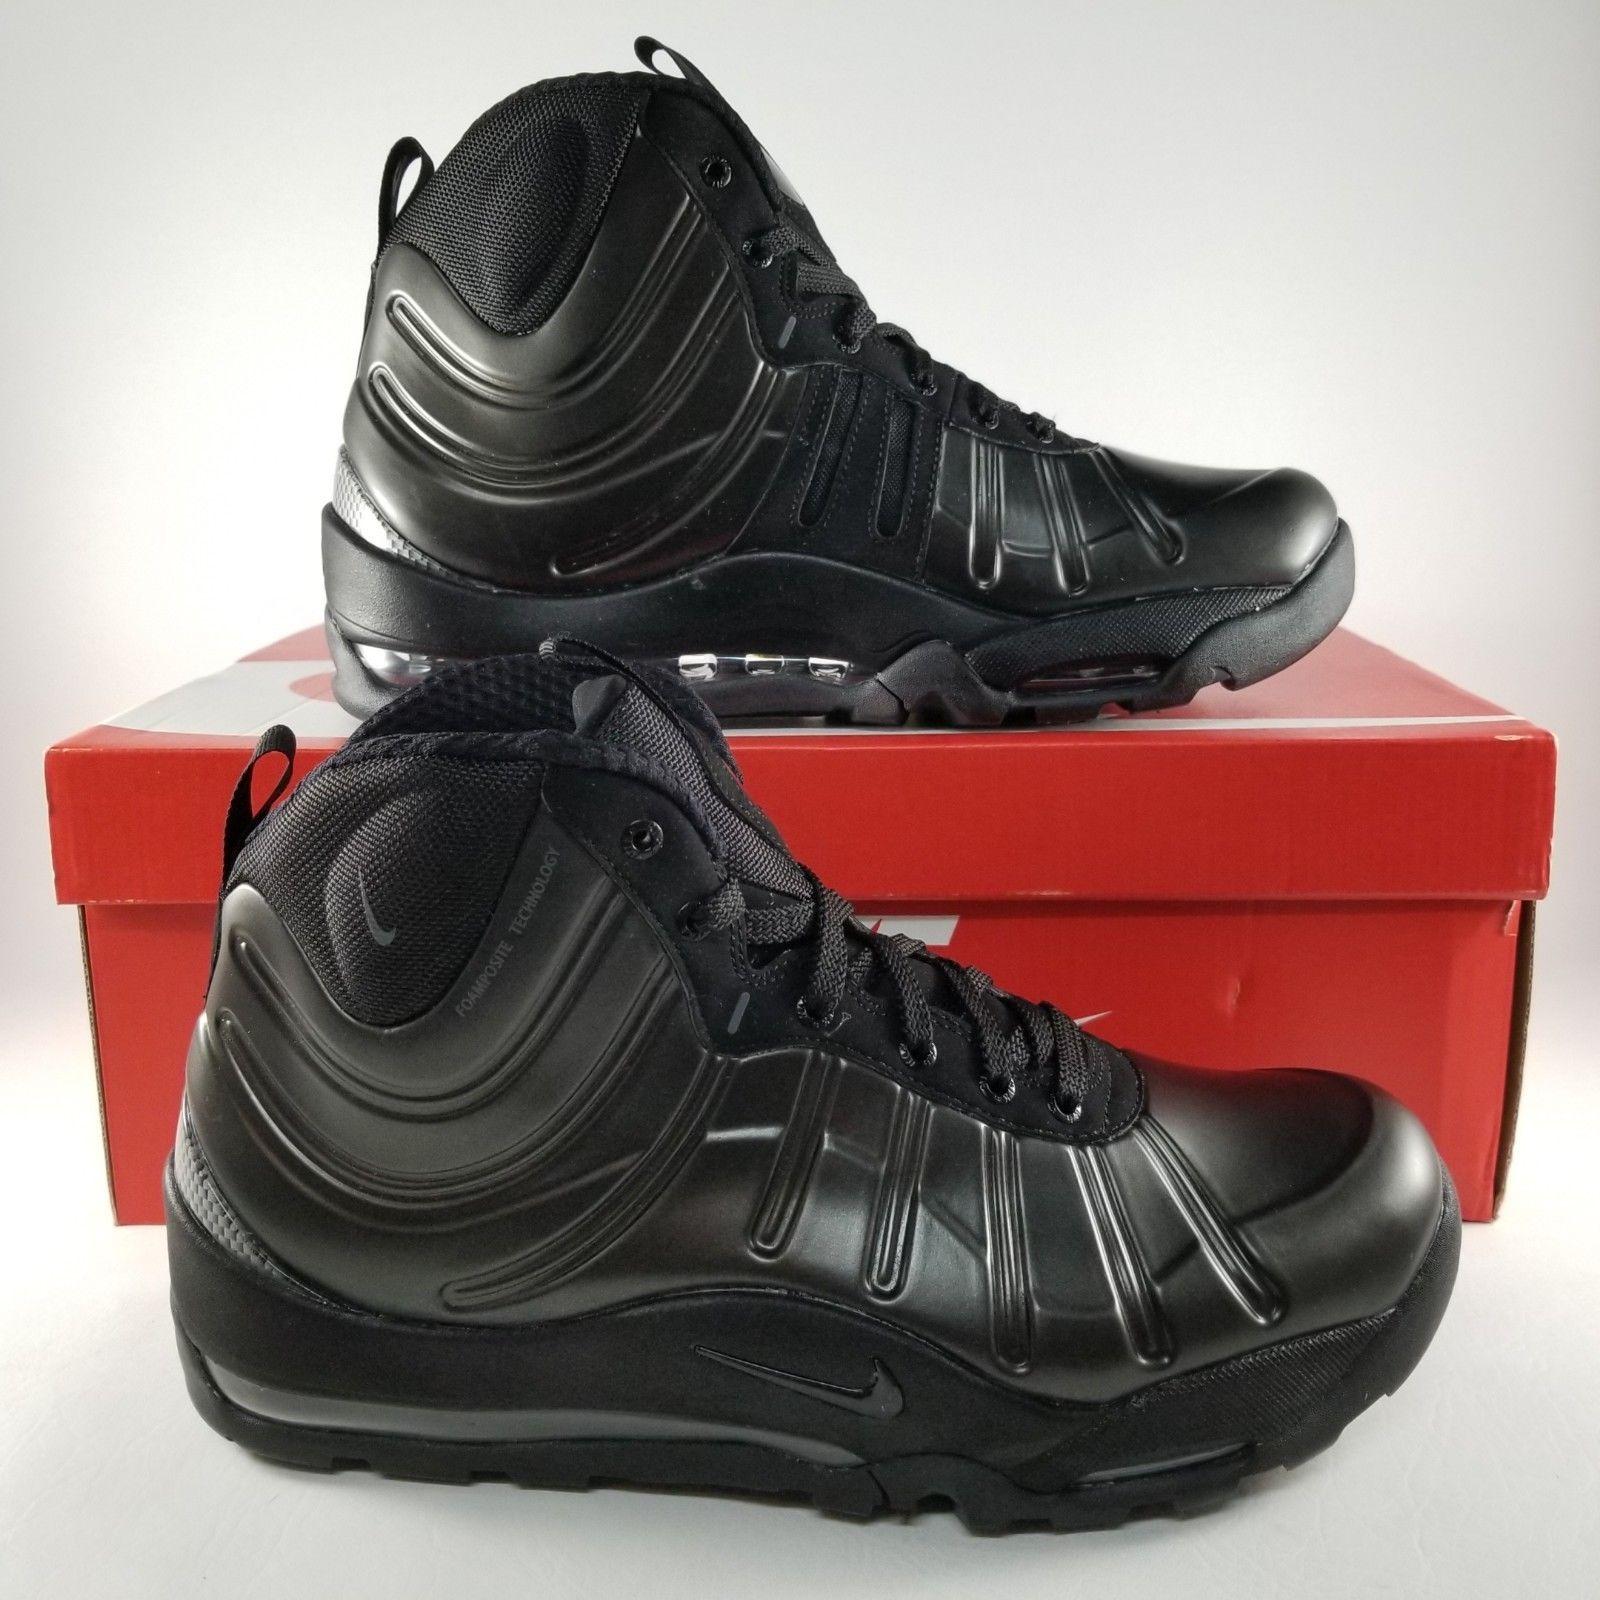 e295e76d859c4 ... new zealand nike air bakin posite mens size 9.5 sneaker boots sneakers  shoes triple black 7db06 ...